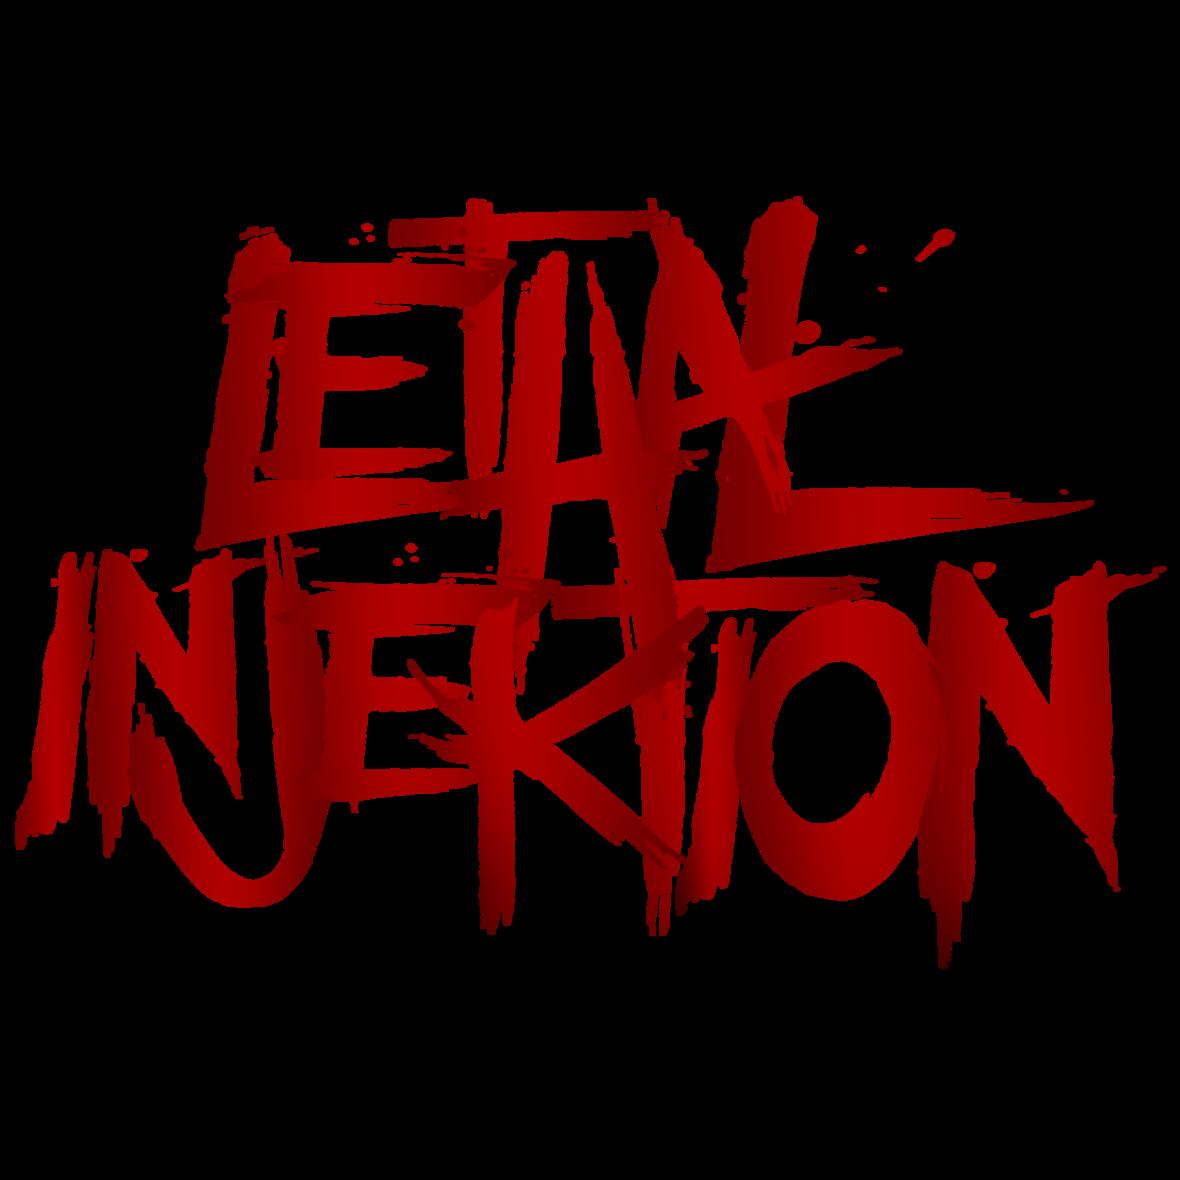 LETHAL INJEKTION LOGO 1